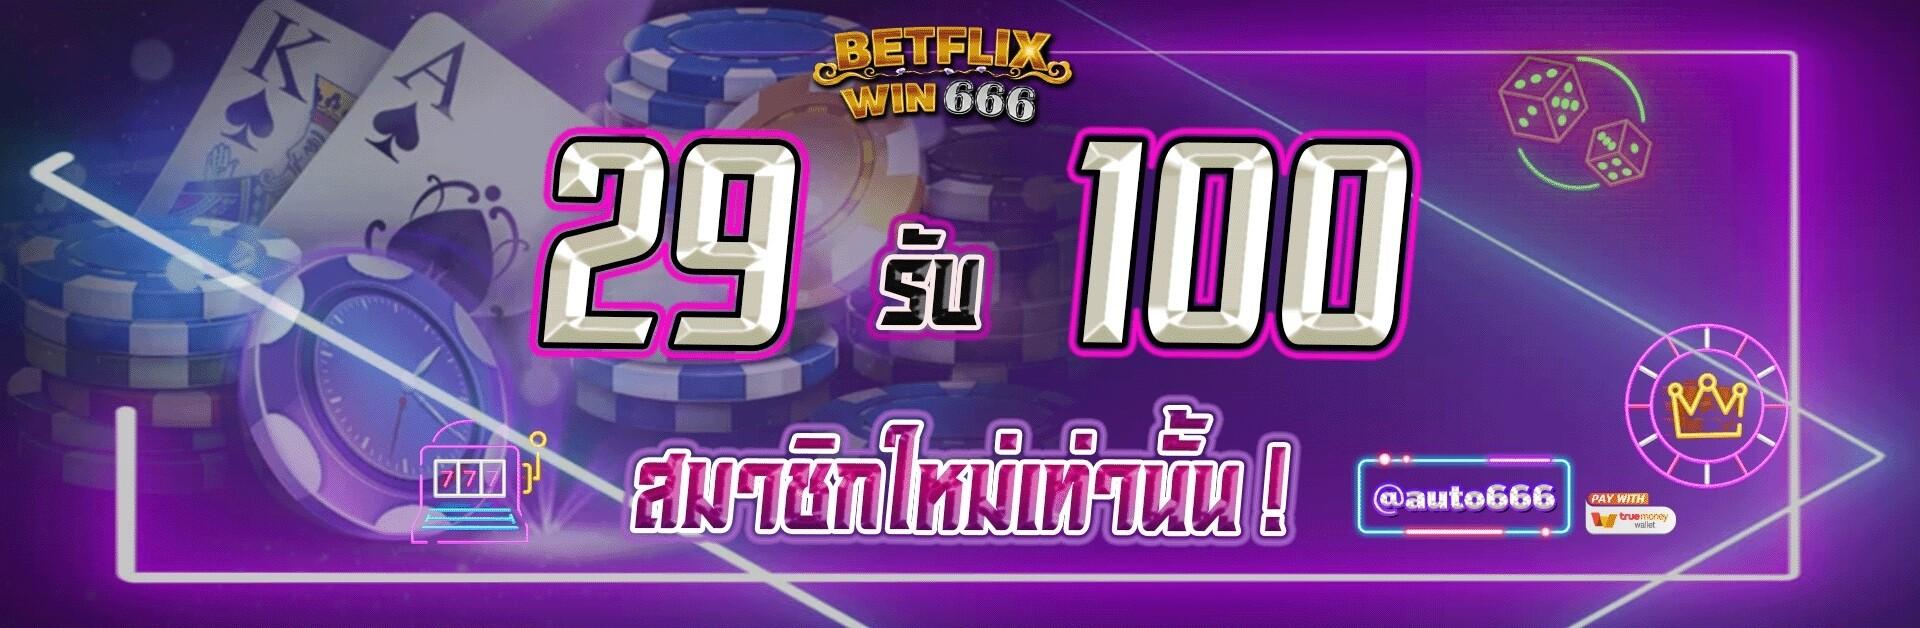 betflix win 666